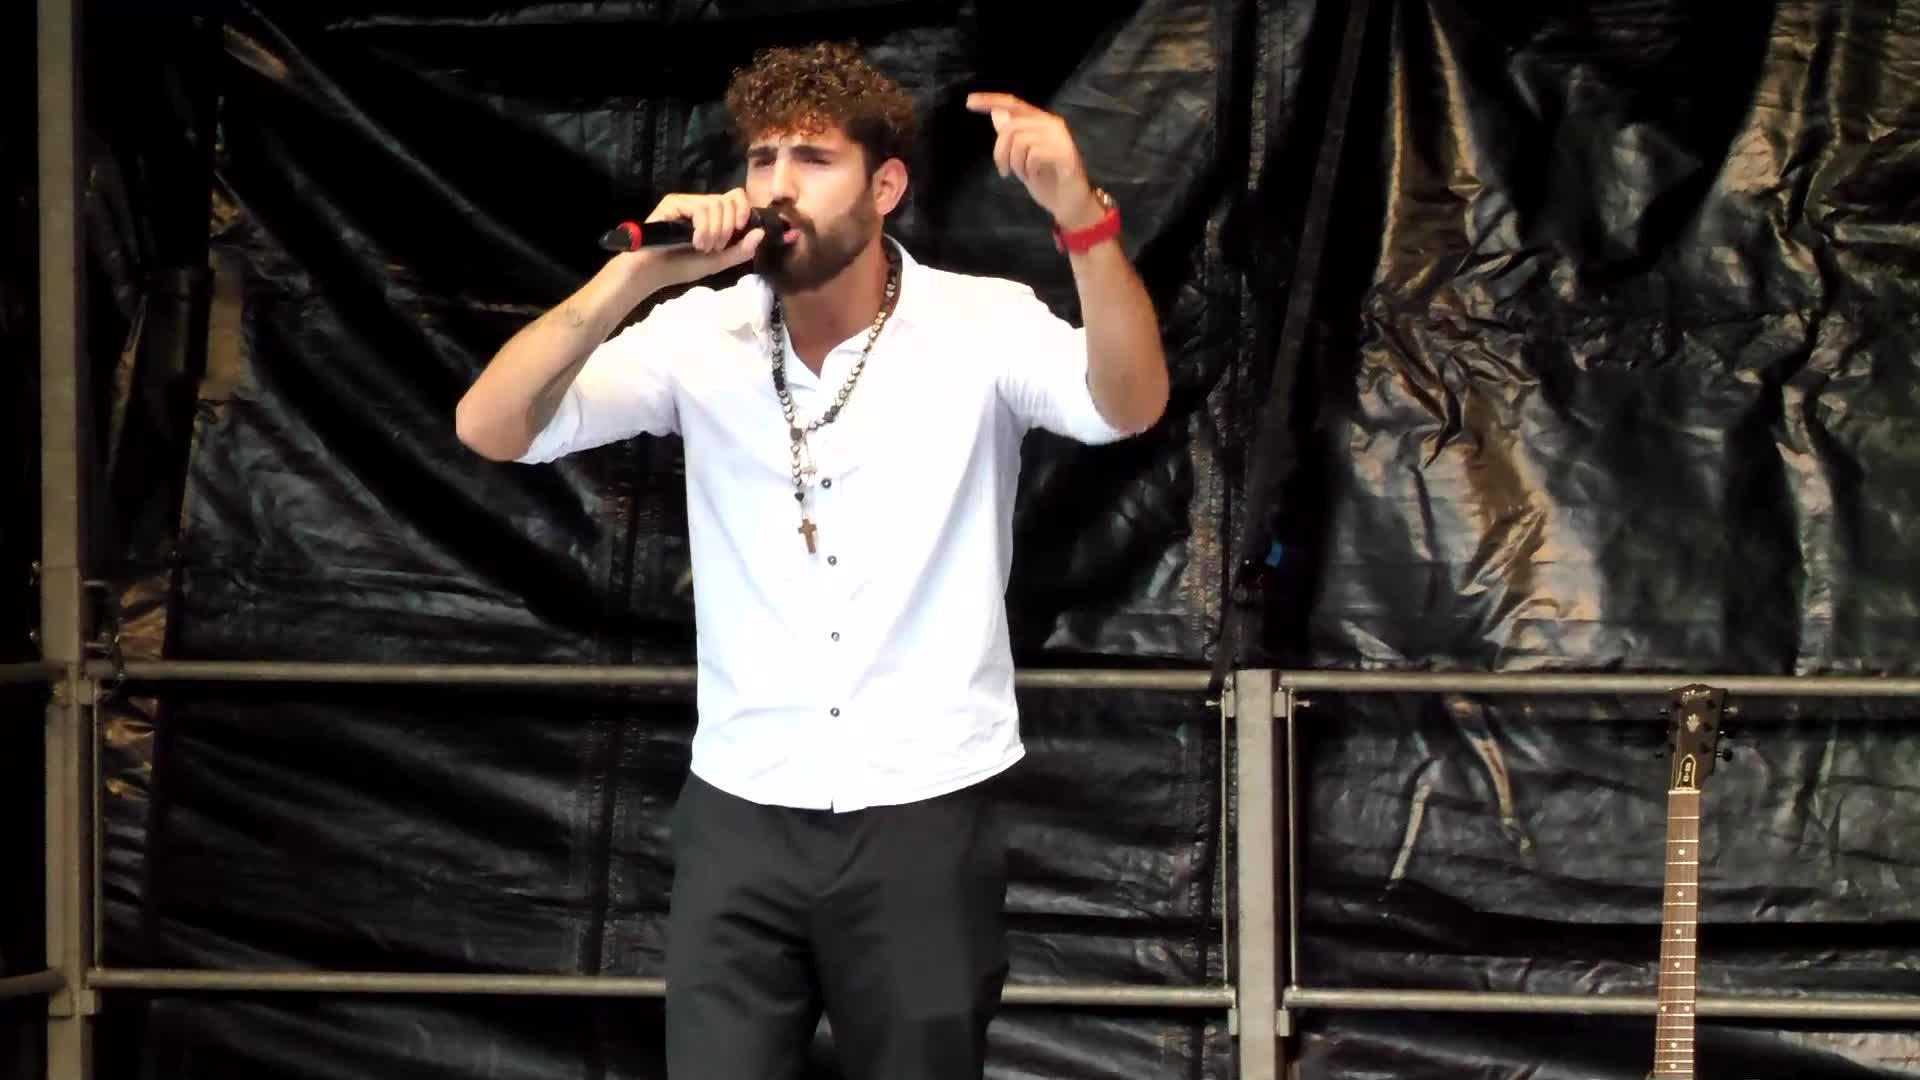 Kundgebung Luzern 31-08-2021: Auftritt: Rapper Maestro (Marco Imbimbo)